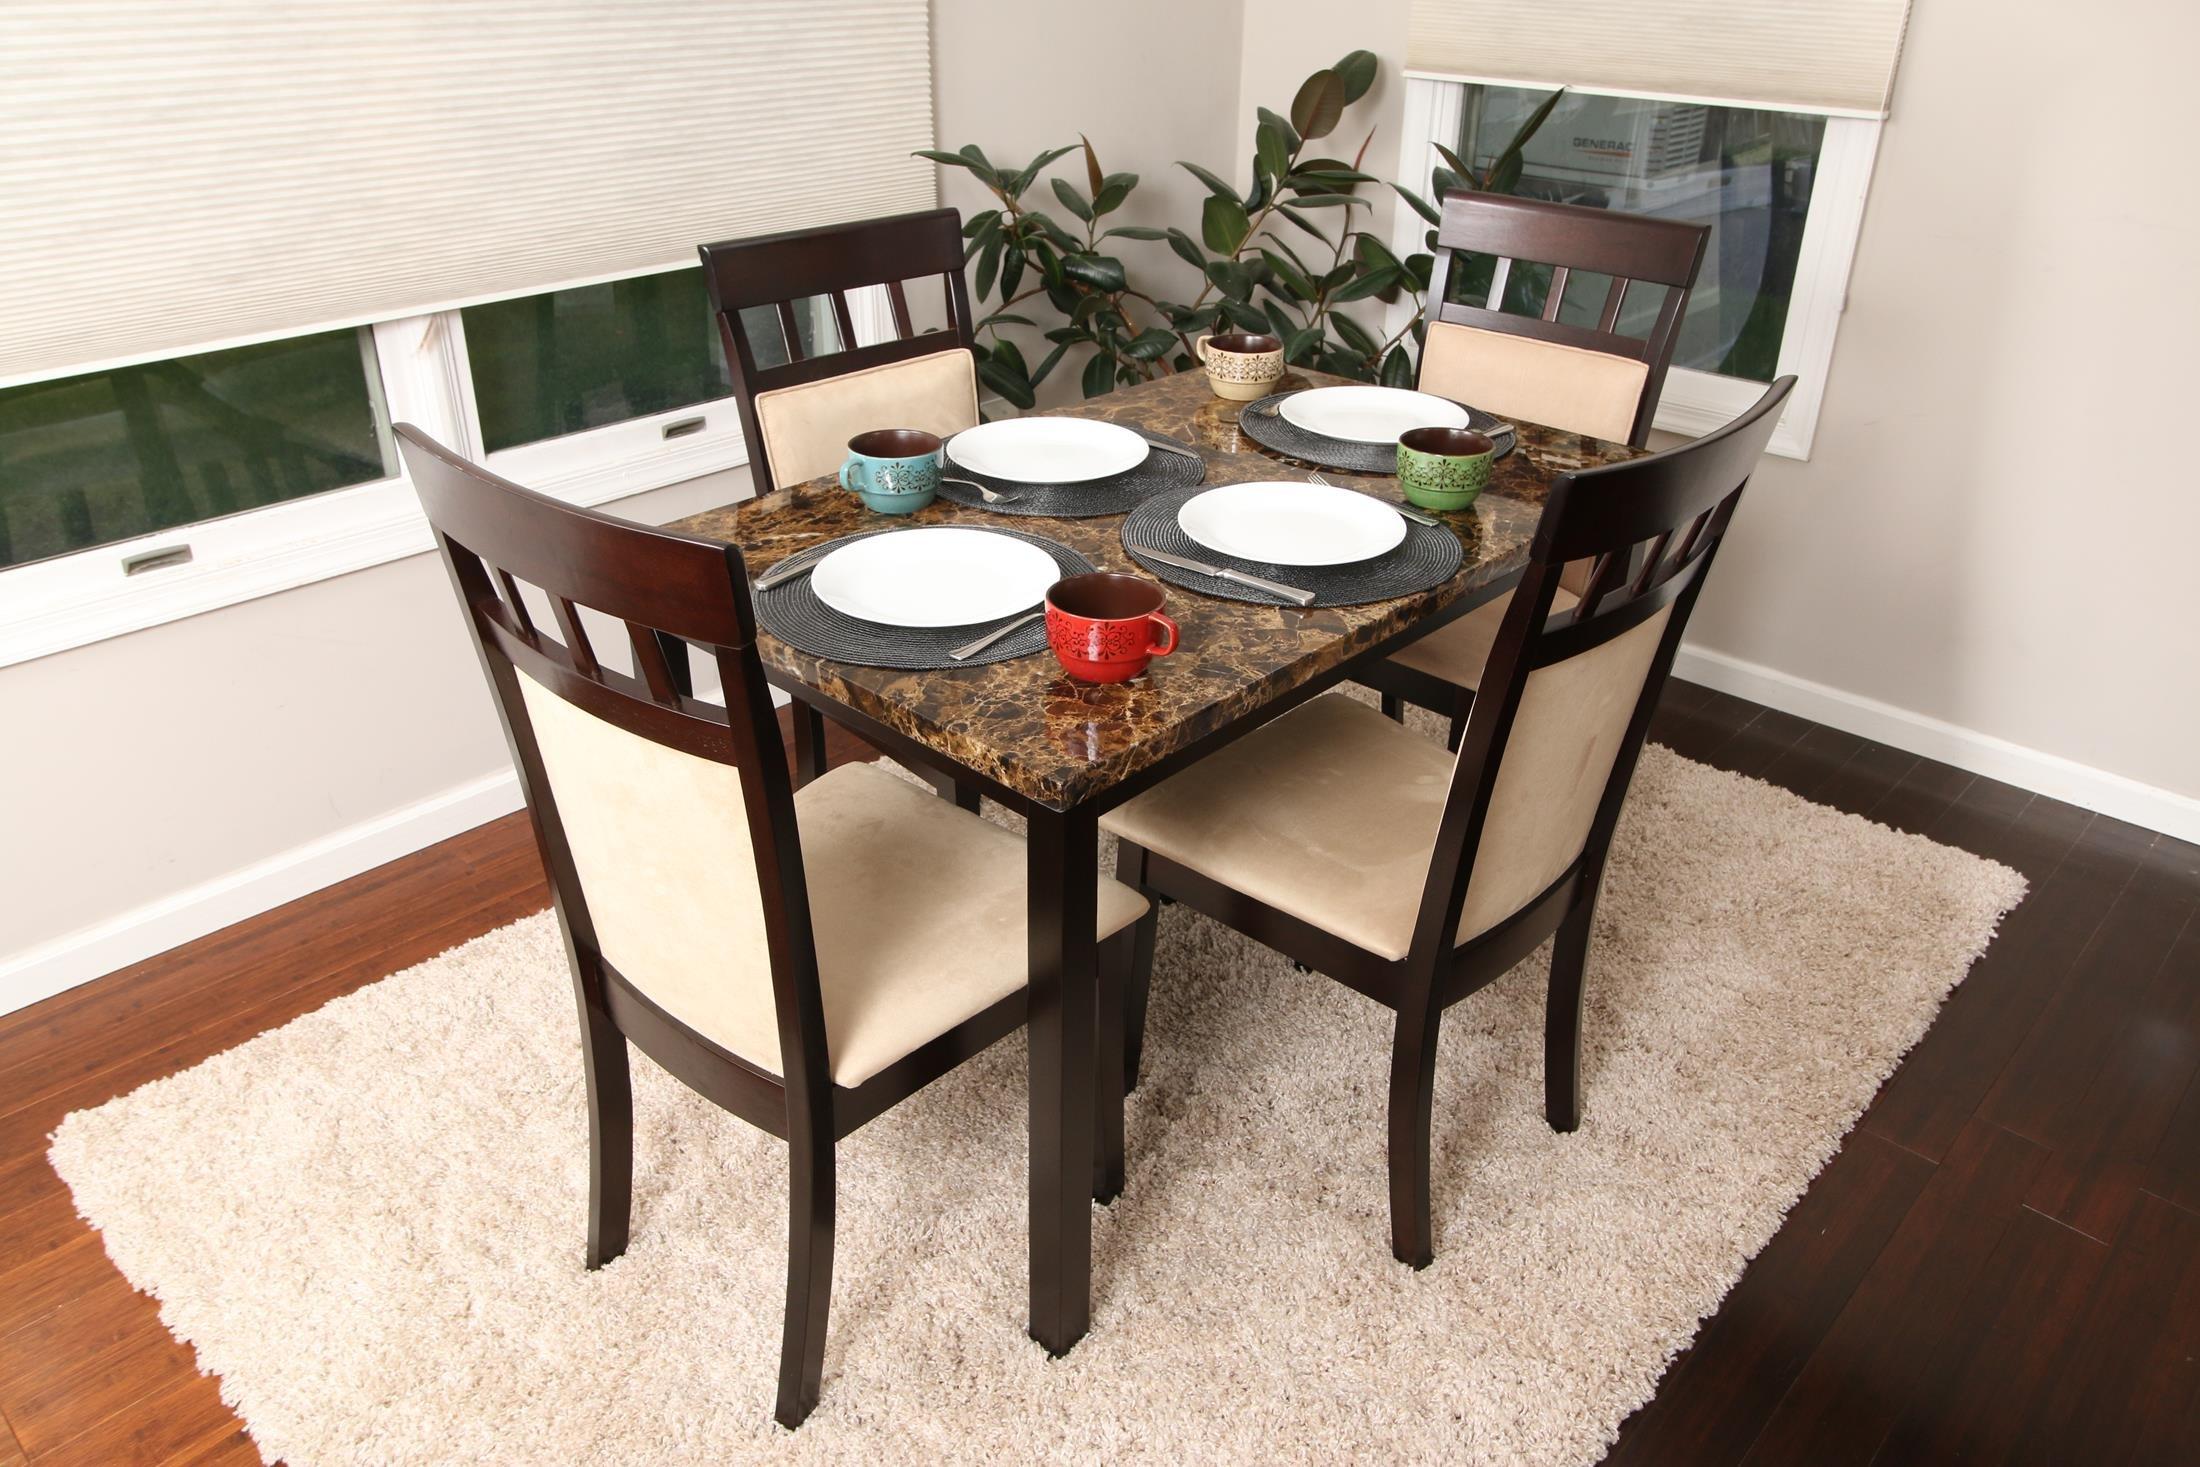 4789e04fa24 5 PC Thick Marble Espresso Brown 4 Person Table and Chairs Brown Dining  Dinette - Espresso